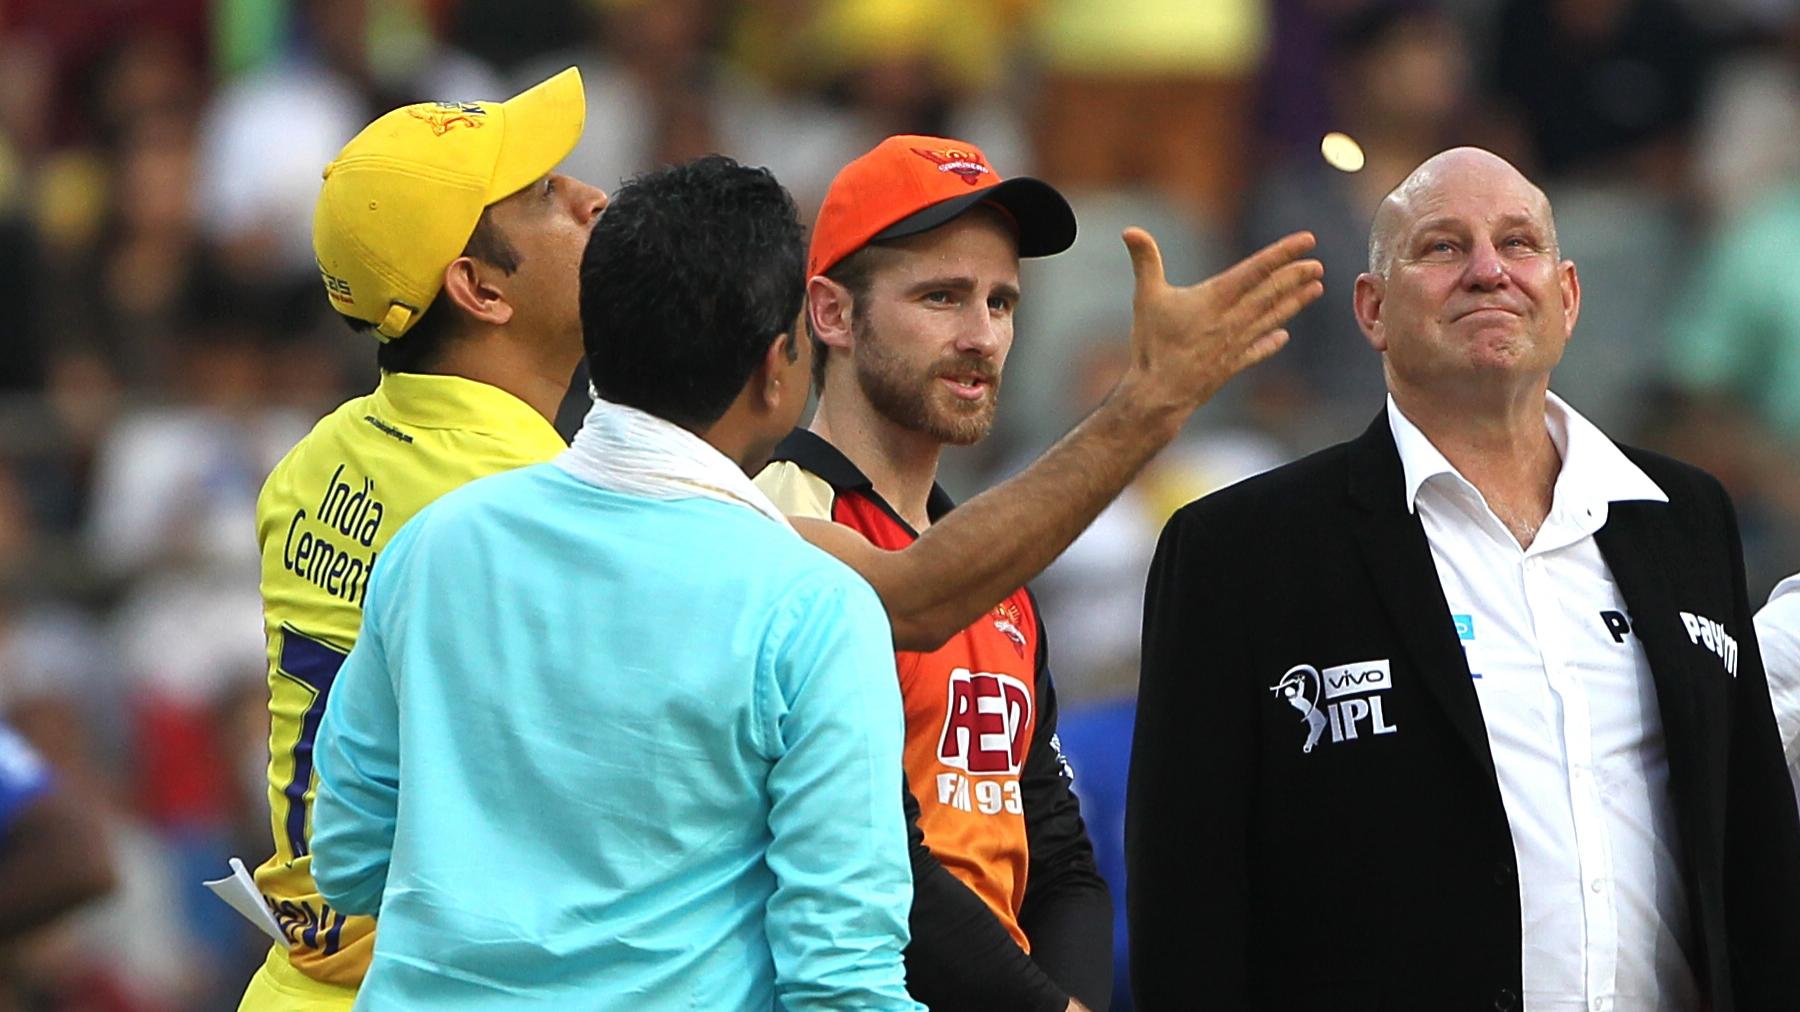 IPL 2018: Sanjay Manjrekar goofs up at the toss in the IPL Final